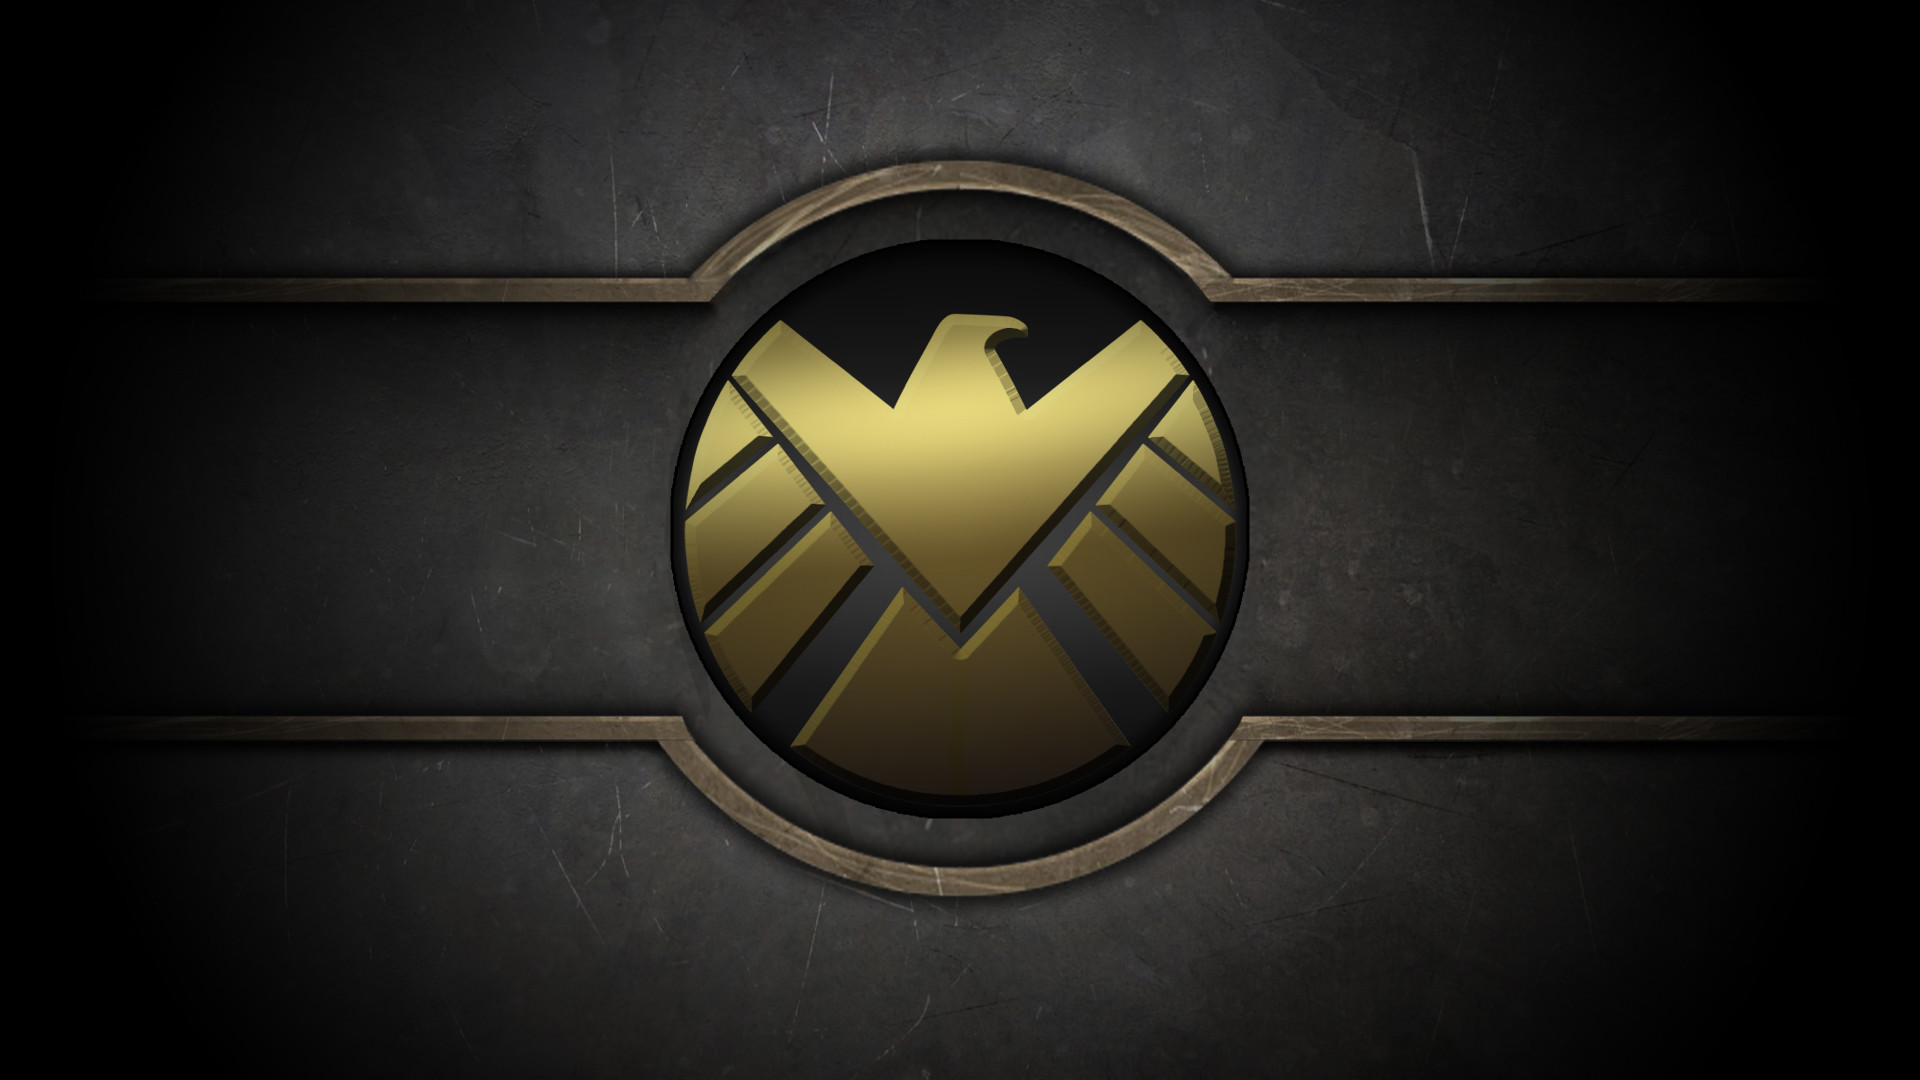 Marvel Shield Logo Wallpaper – WallpaperSafari | Adorable Wallpapers |  Pinterest | Shield logo, Marvel and Saint seiya